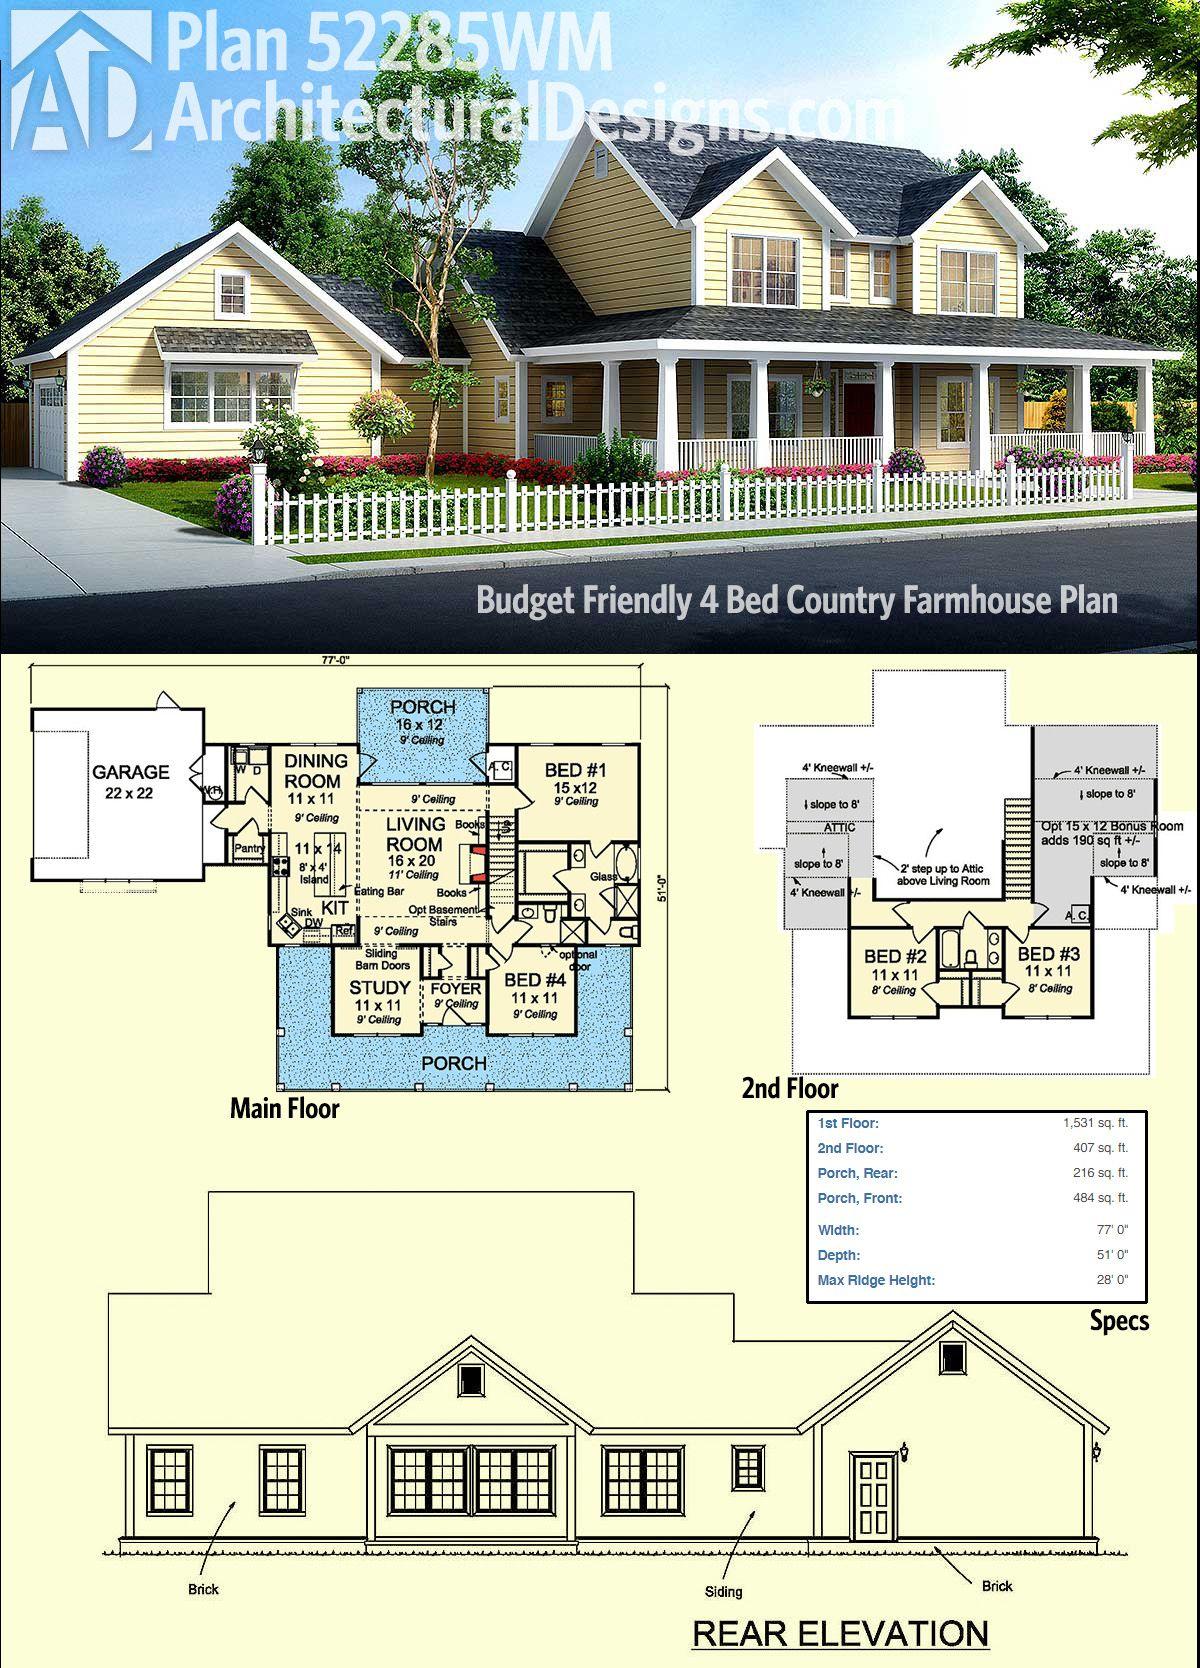 introducing architectural designs country farmhouse plan 52285wm rh pinterest com